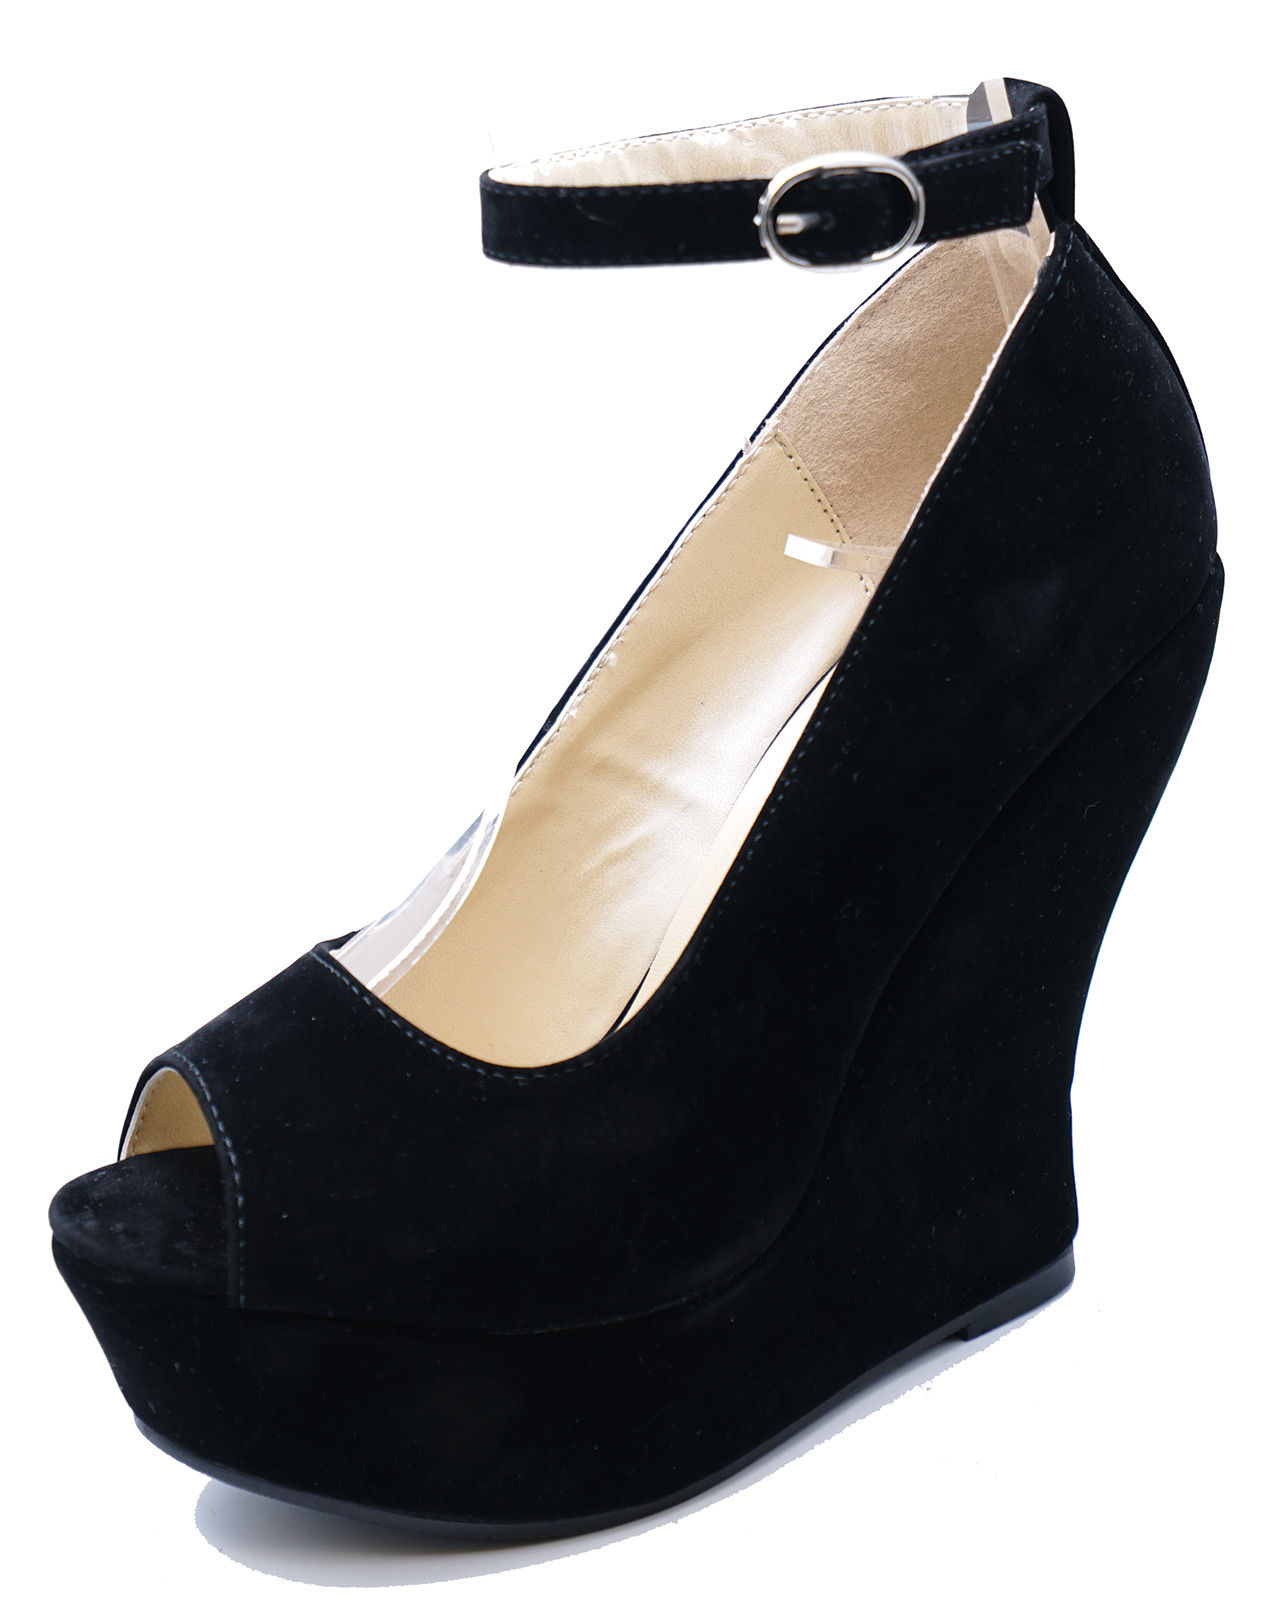 3547177e9cde LODIČKY NA PLNEJ PLATFORME BLACK SUEDE – Sissy Boutique